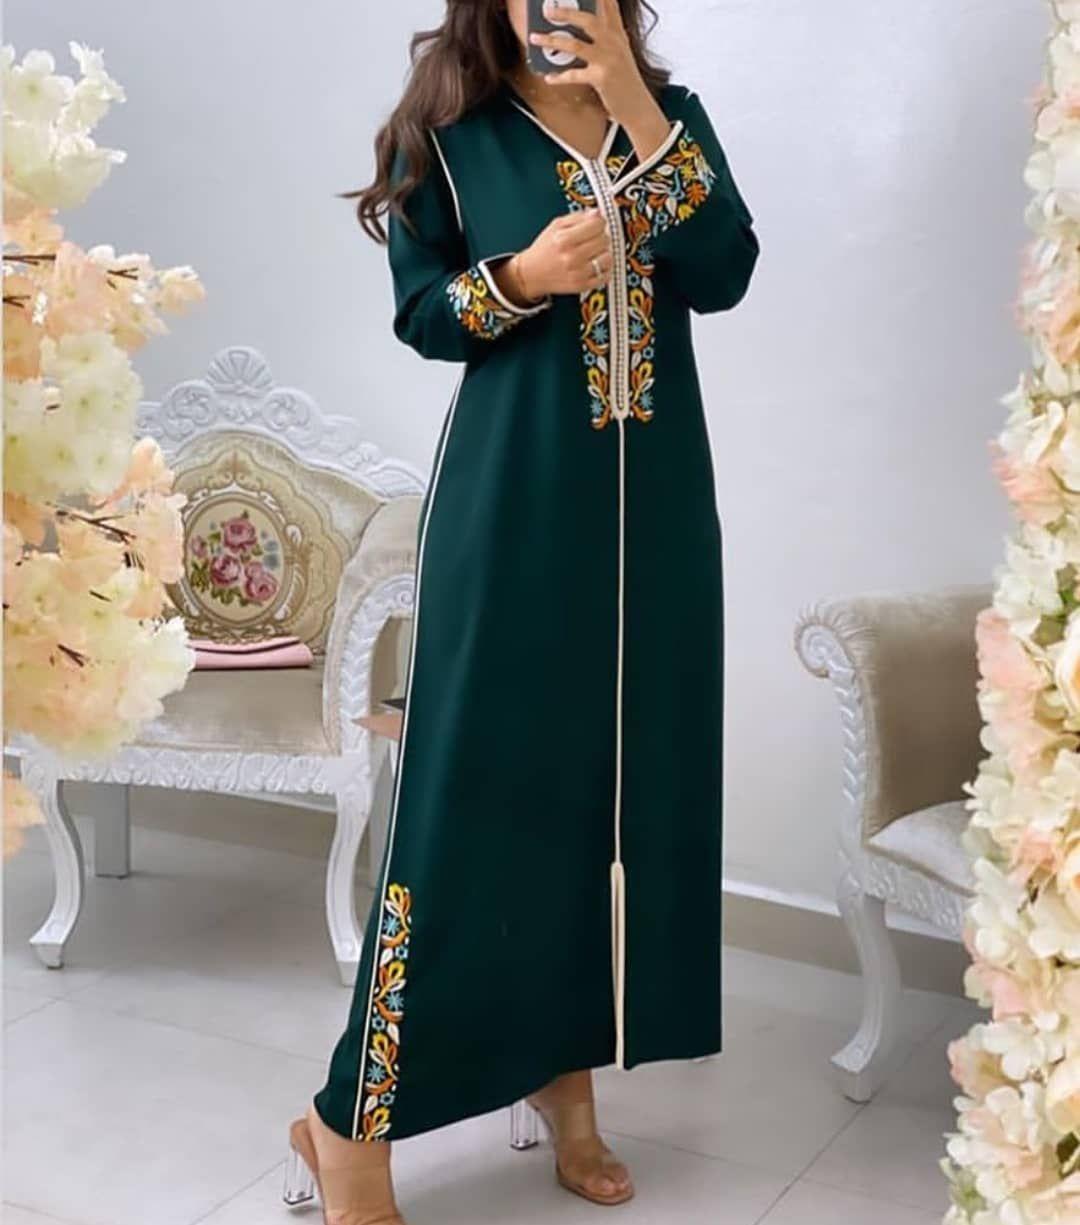 530 Mentions J Aime 0 Commentaires قفطان جلابيات كشخه دراعه Caftan Alhasnae Sur Instagram جا Moroccan Dress Islamic Clothing Abayas Kalamkari Dresses